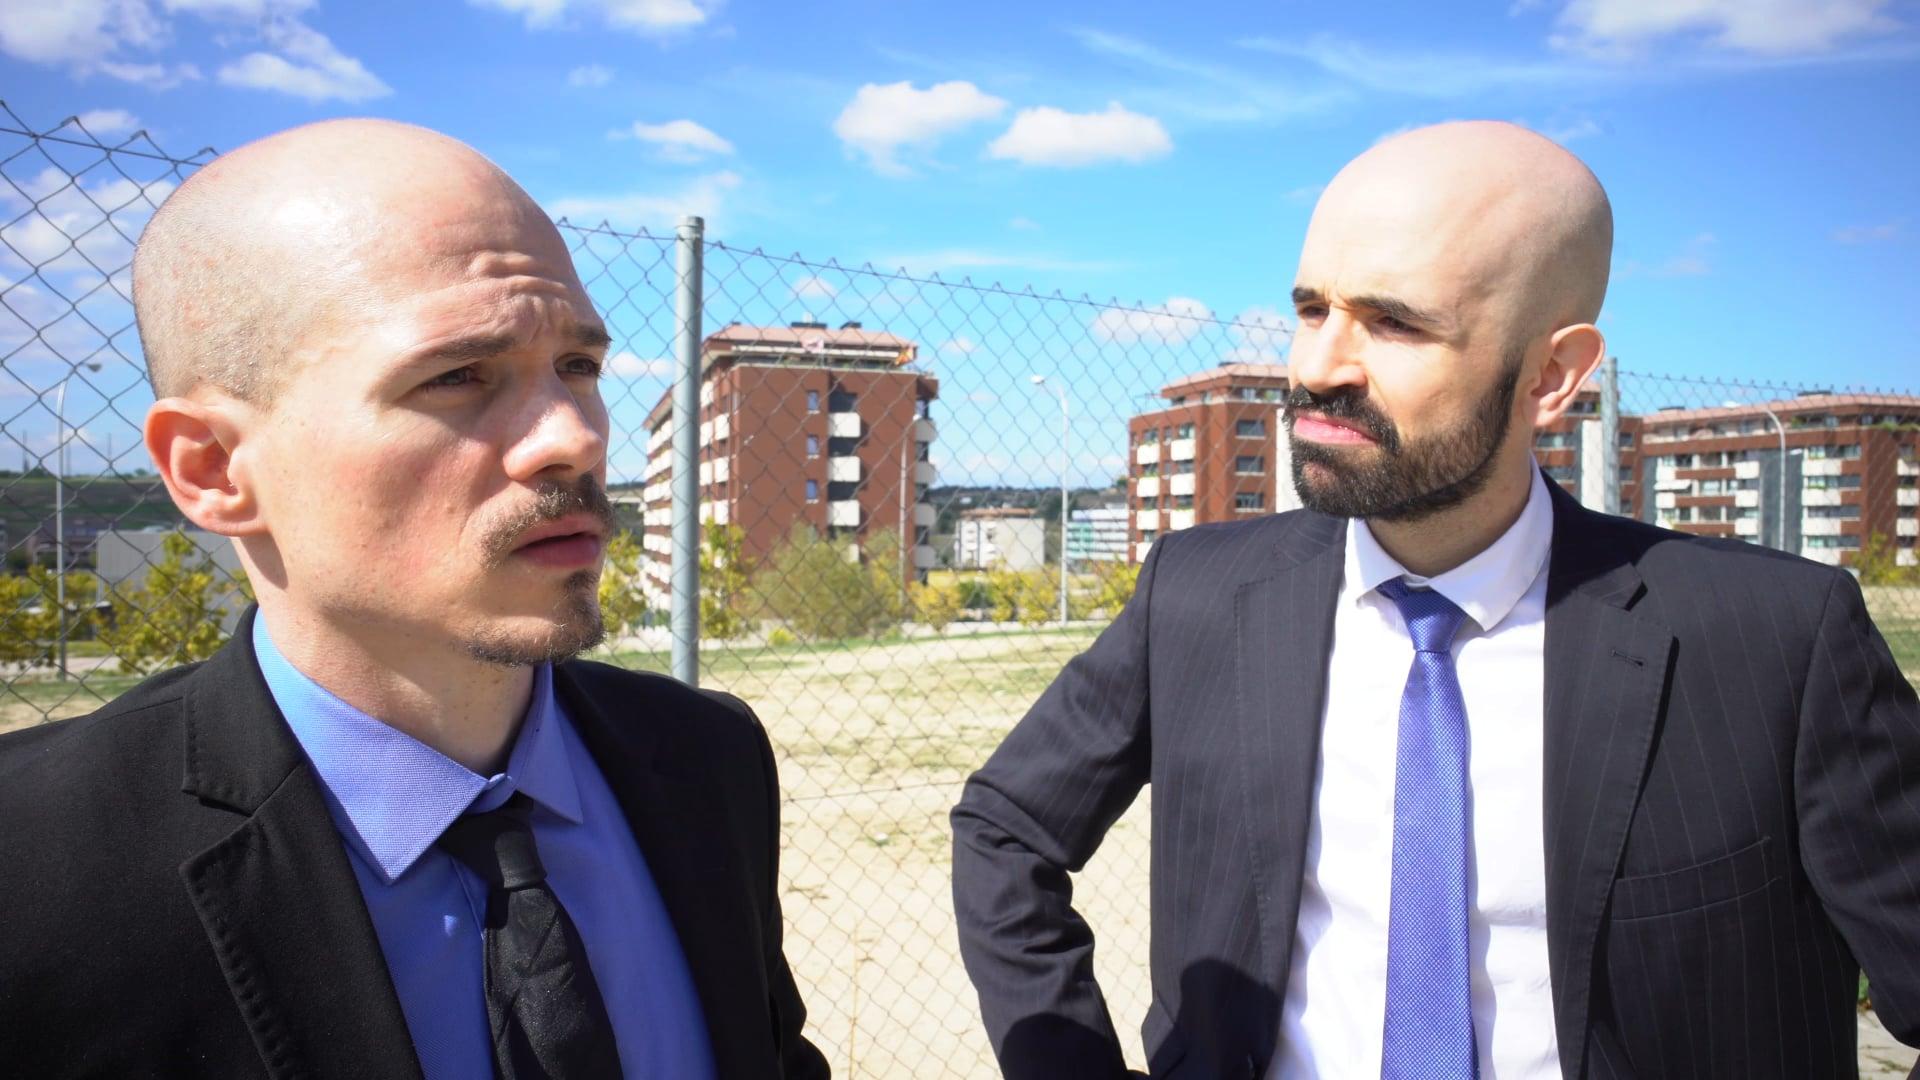 Miguel e Claudio   SCENA ITALIANA